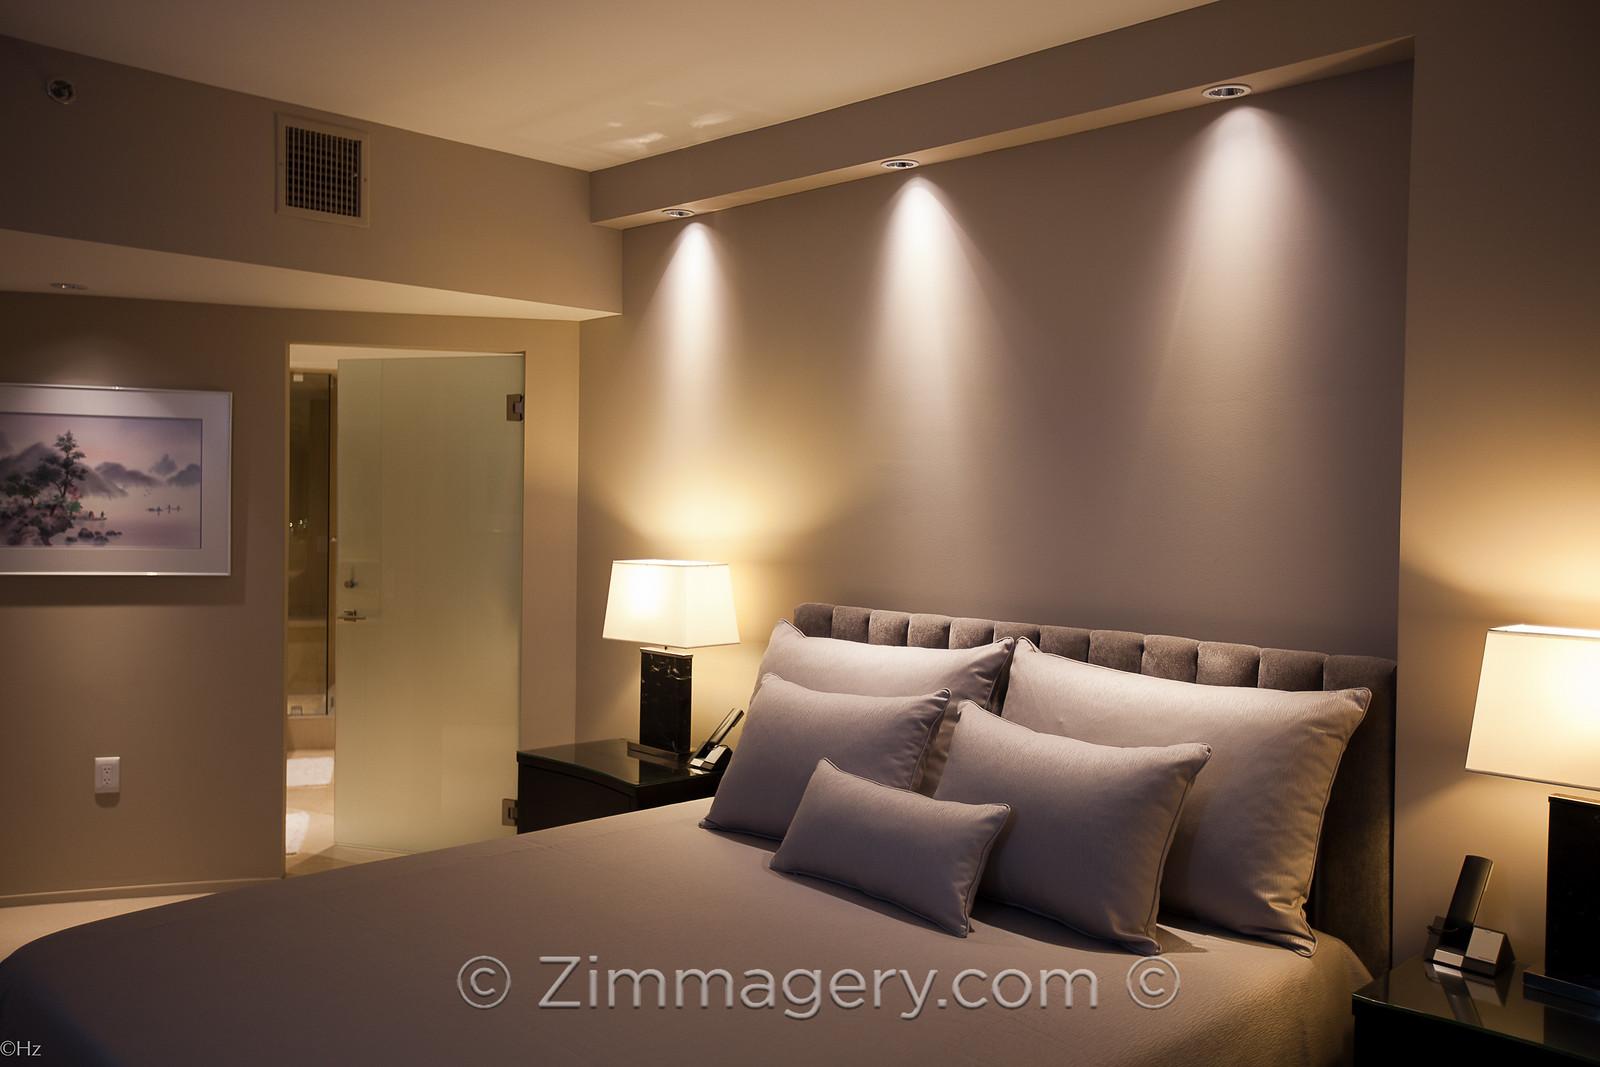 Real Estate MLS Shot, Mater Bedroom, The Cove